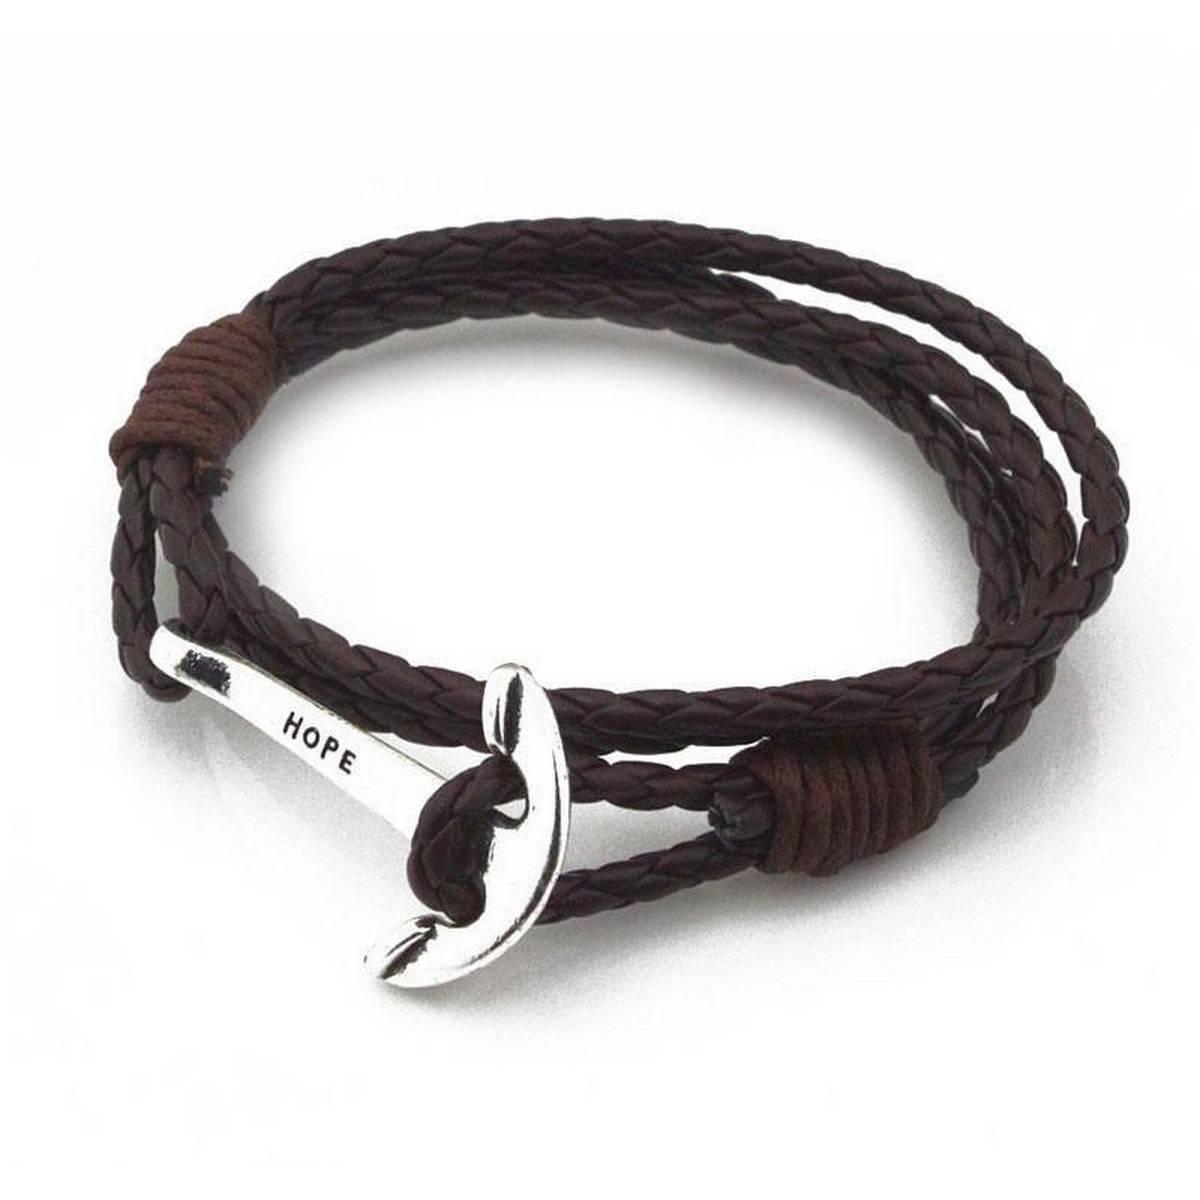 40cm PU Leather Men Bracelet Jewelry Man Anchor Bracelet Wristband Charm Braclet For Male Accessories